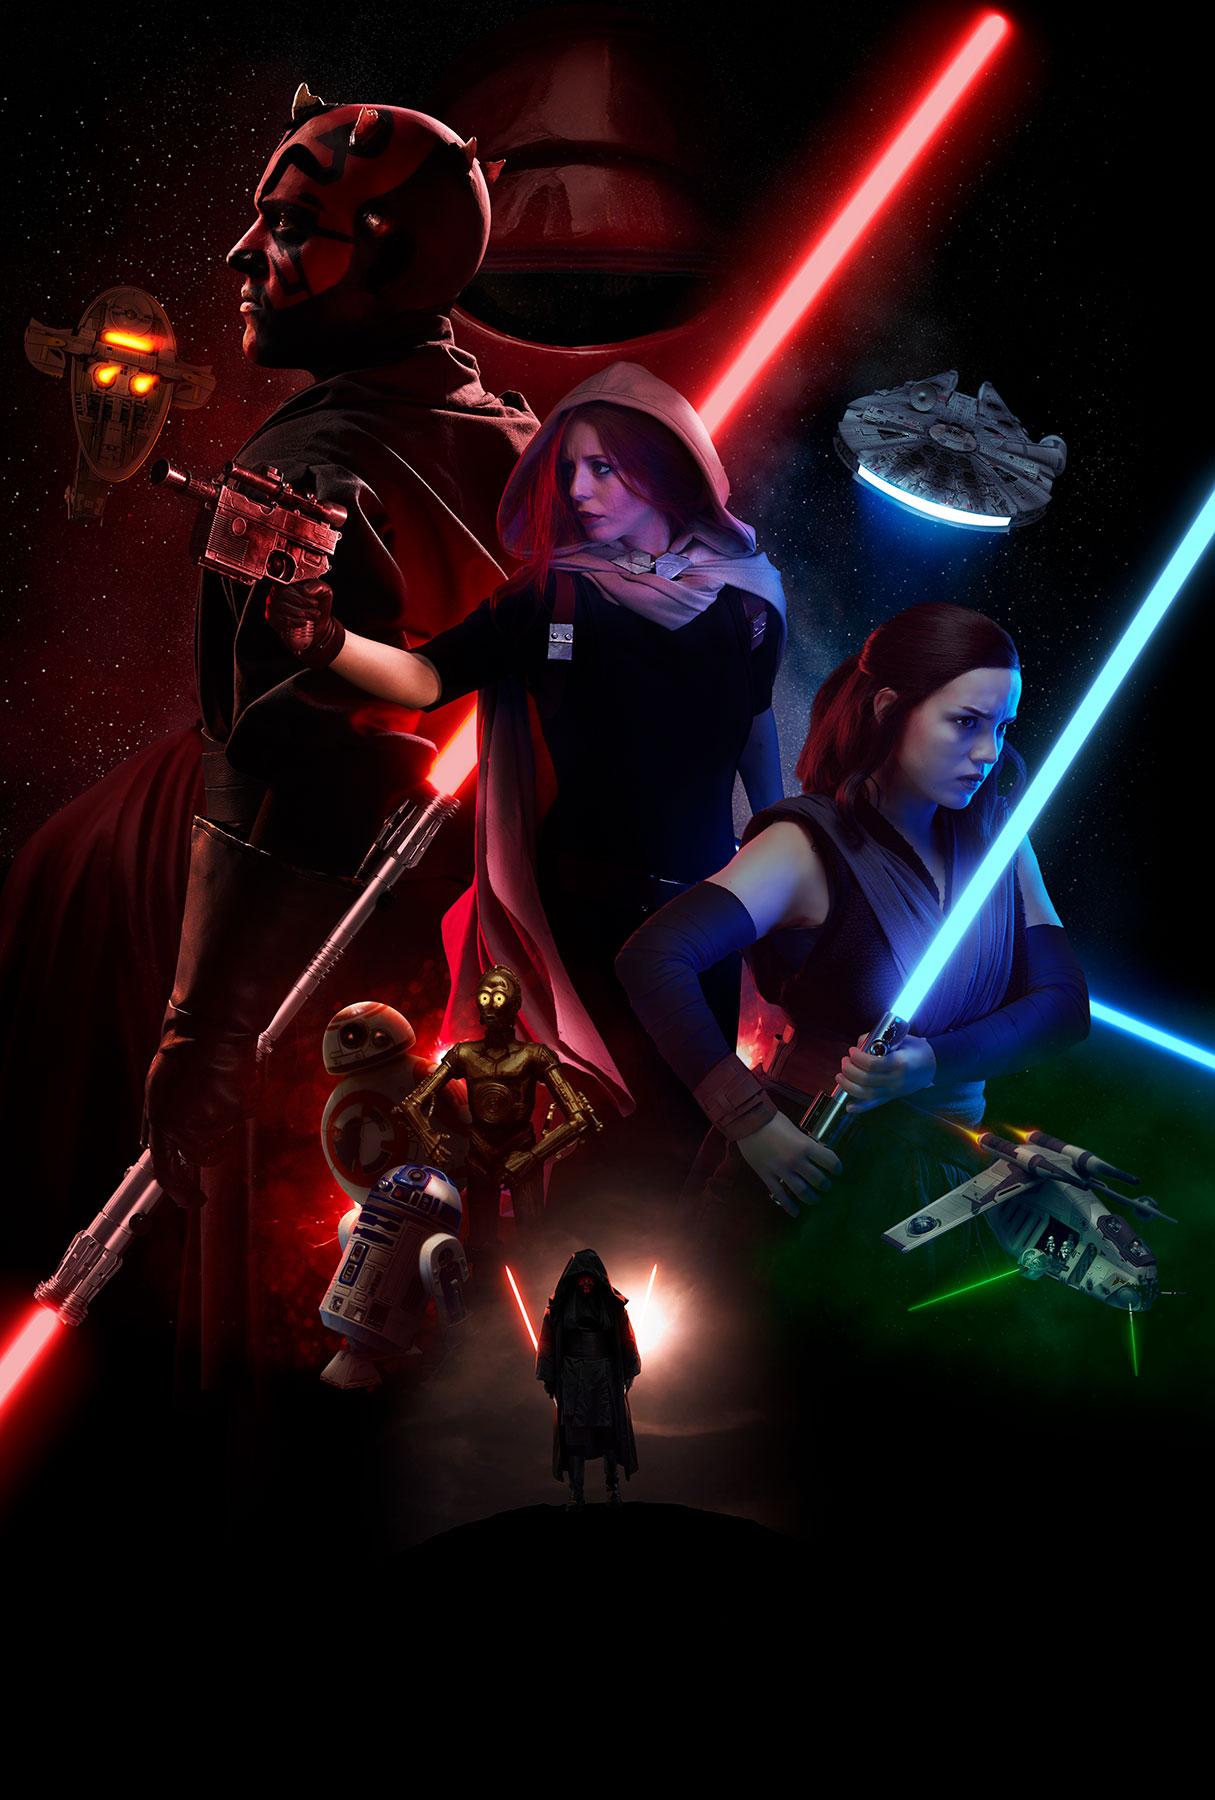 Sayanoff Arthur Star Wars Poster 02 14